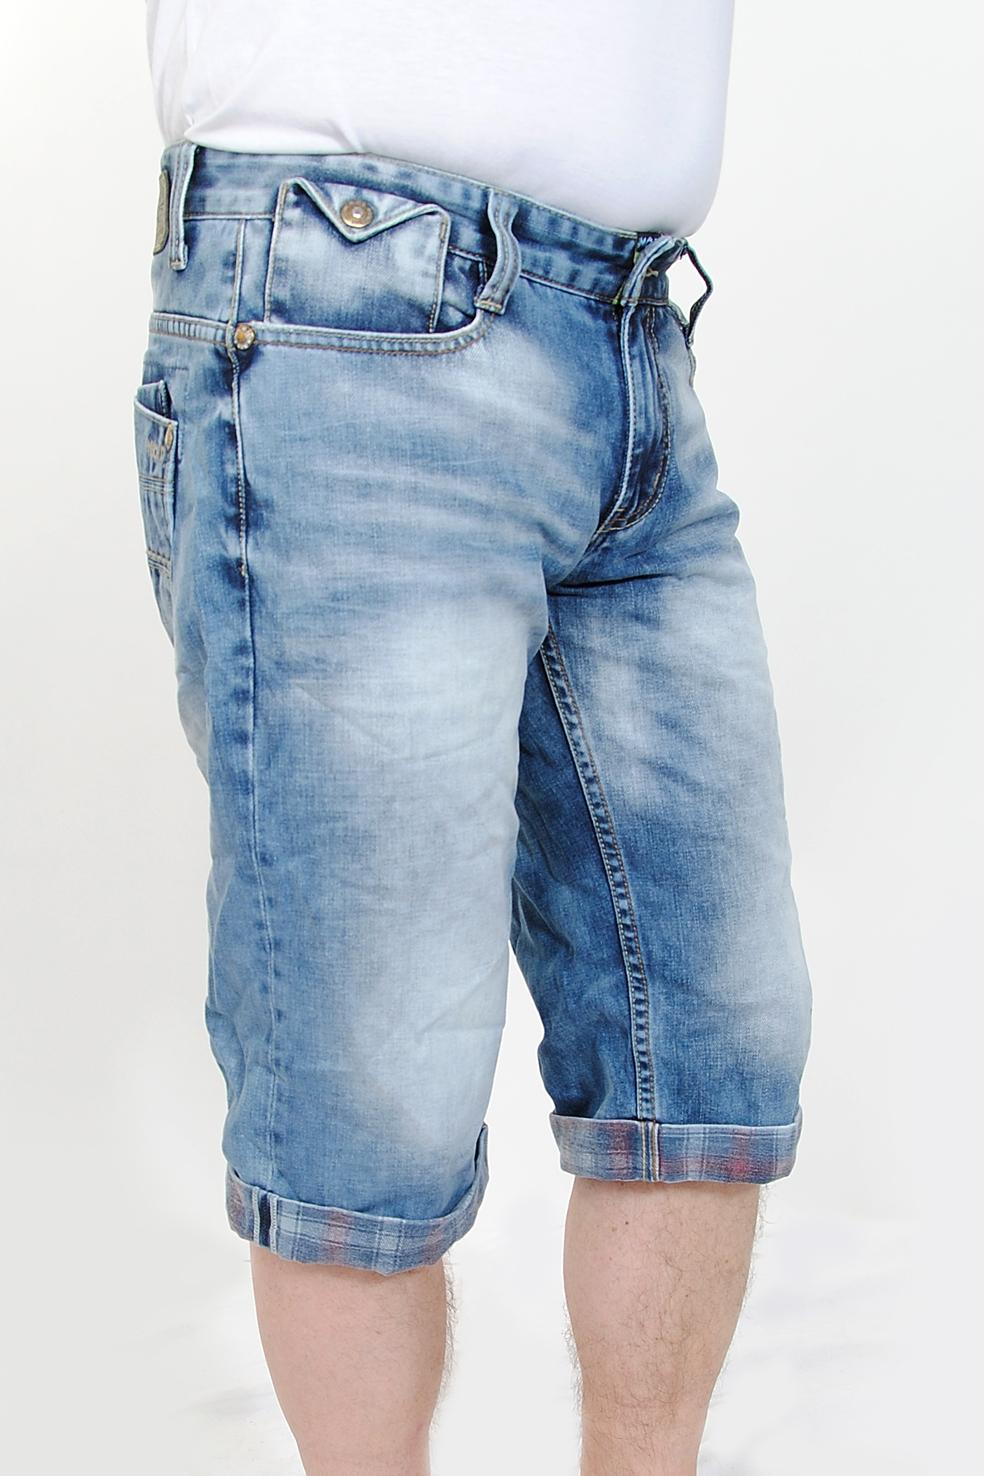 m o d herren bermuda jeans benji crocus blue ebay. Black Bedroom Furniture Sets. Home Design Ideas